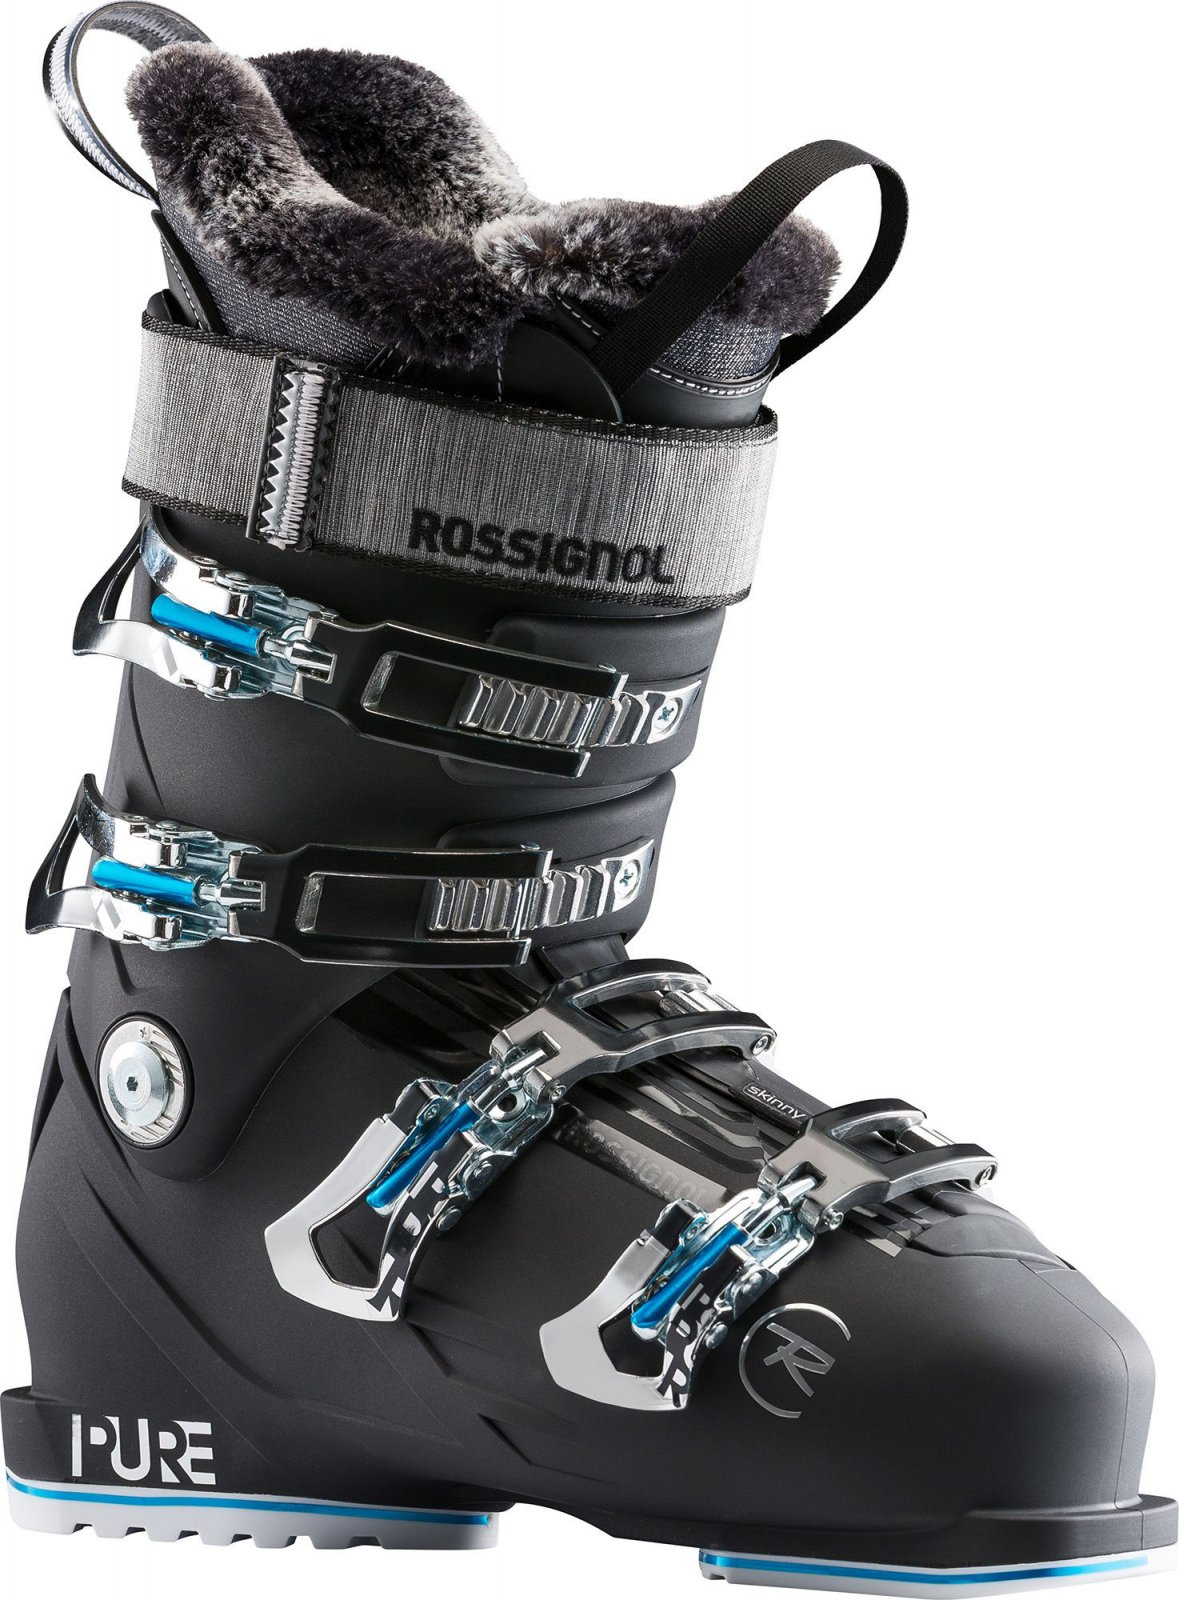 Rossignol Pure Elite 90 Women's Ski Boots